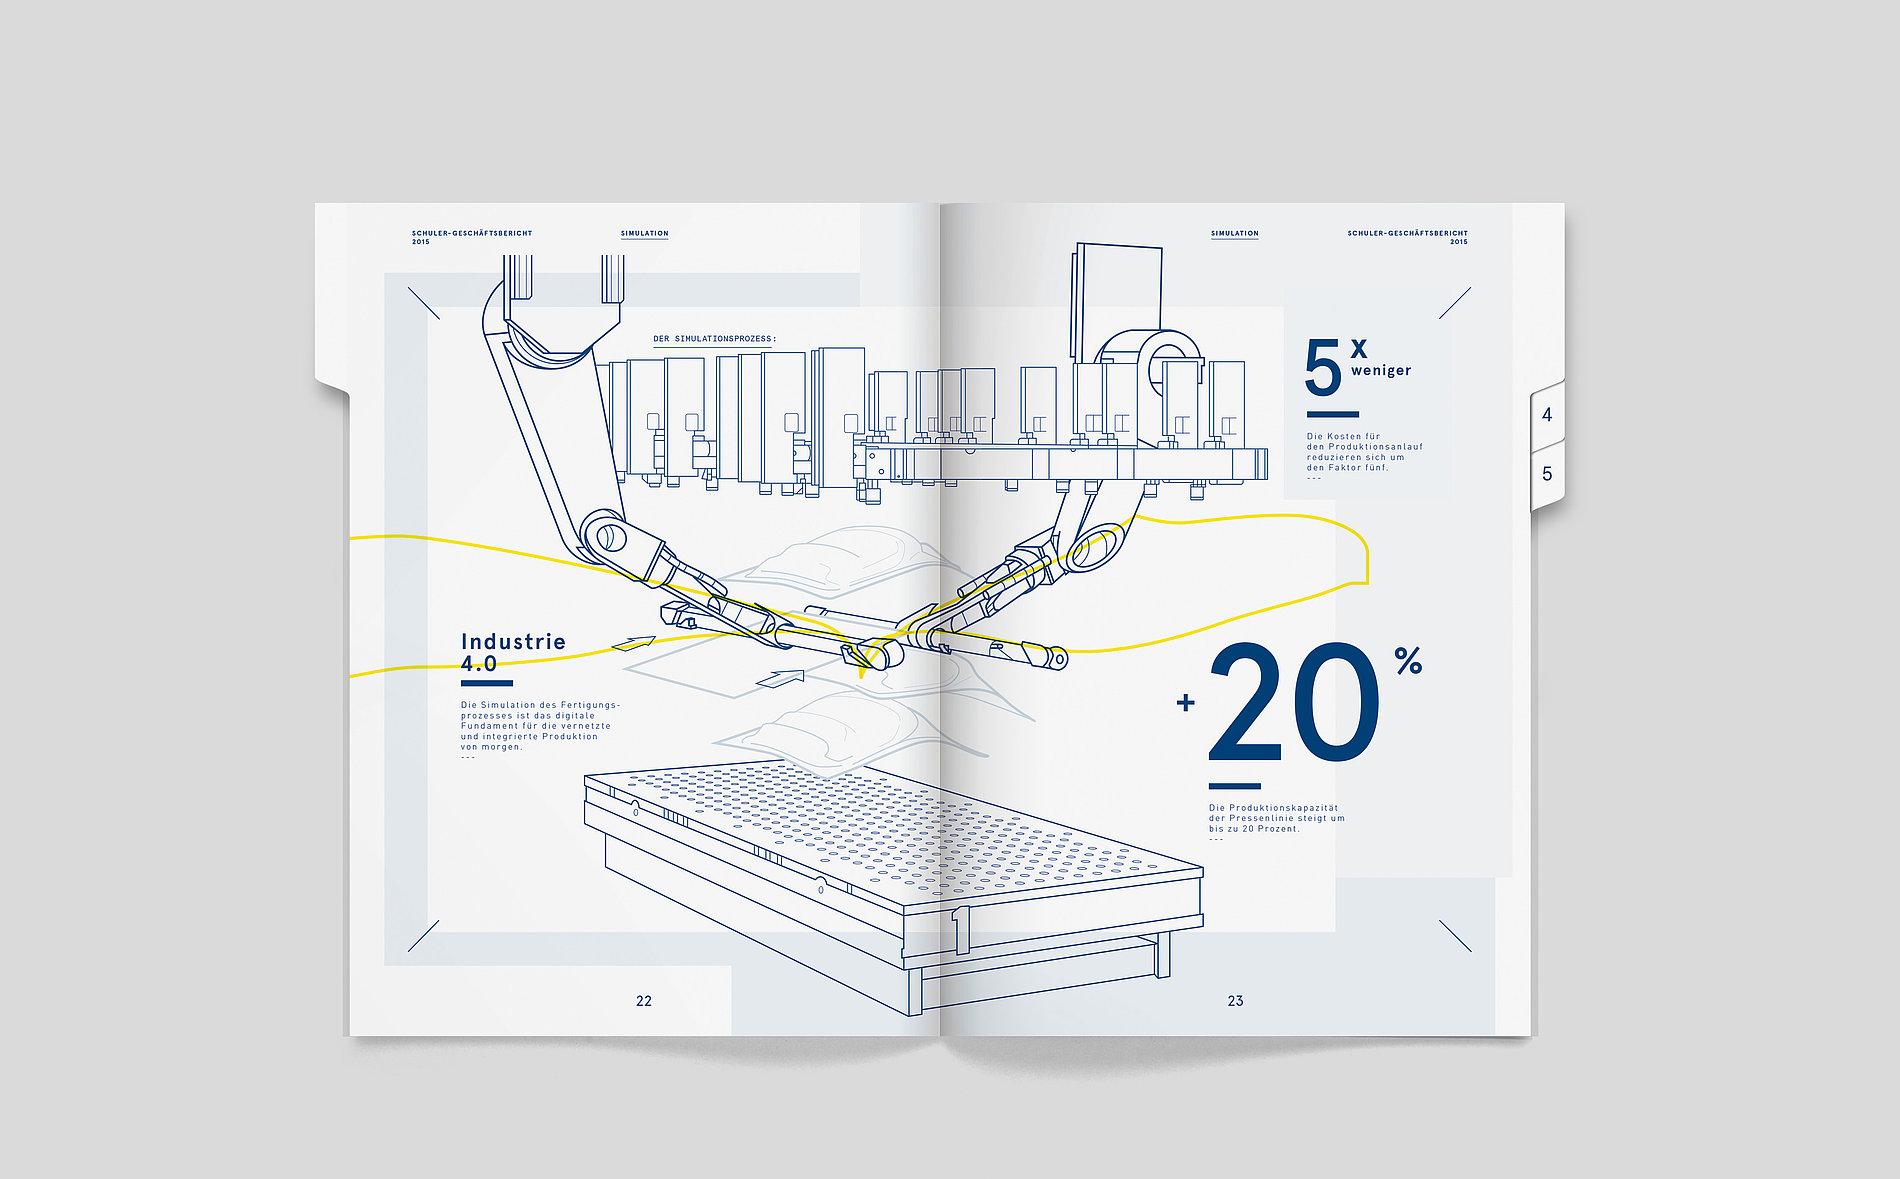 Rethinking Efficiency – Schuler Annual Report 2015 | Red Dot Design Award